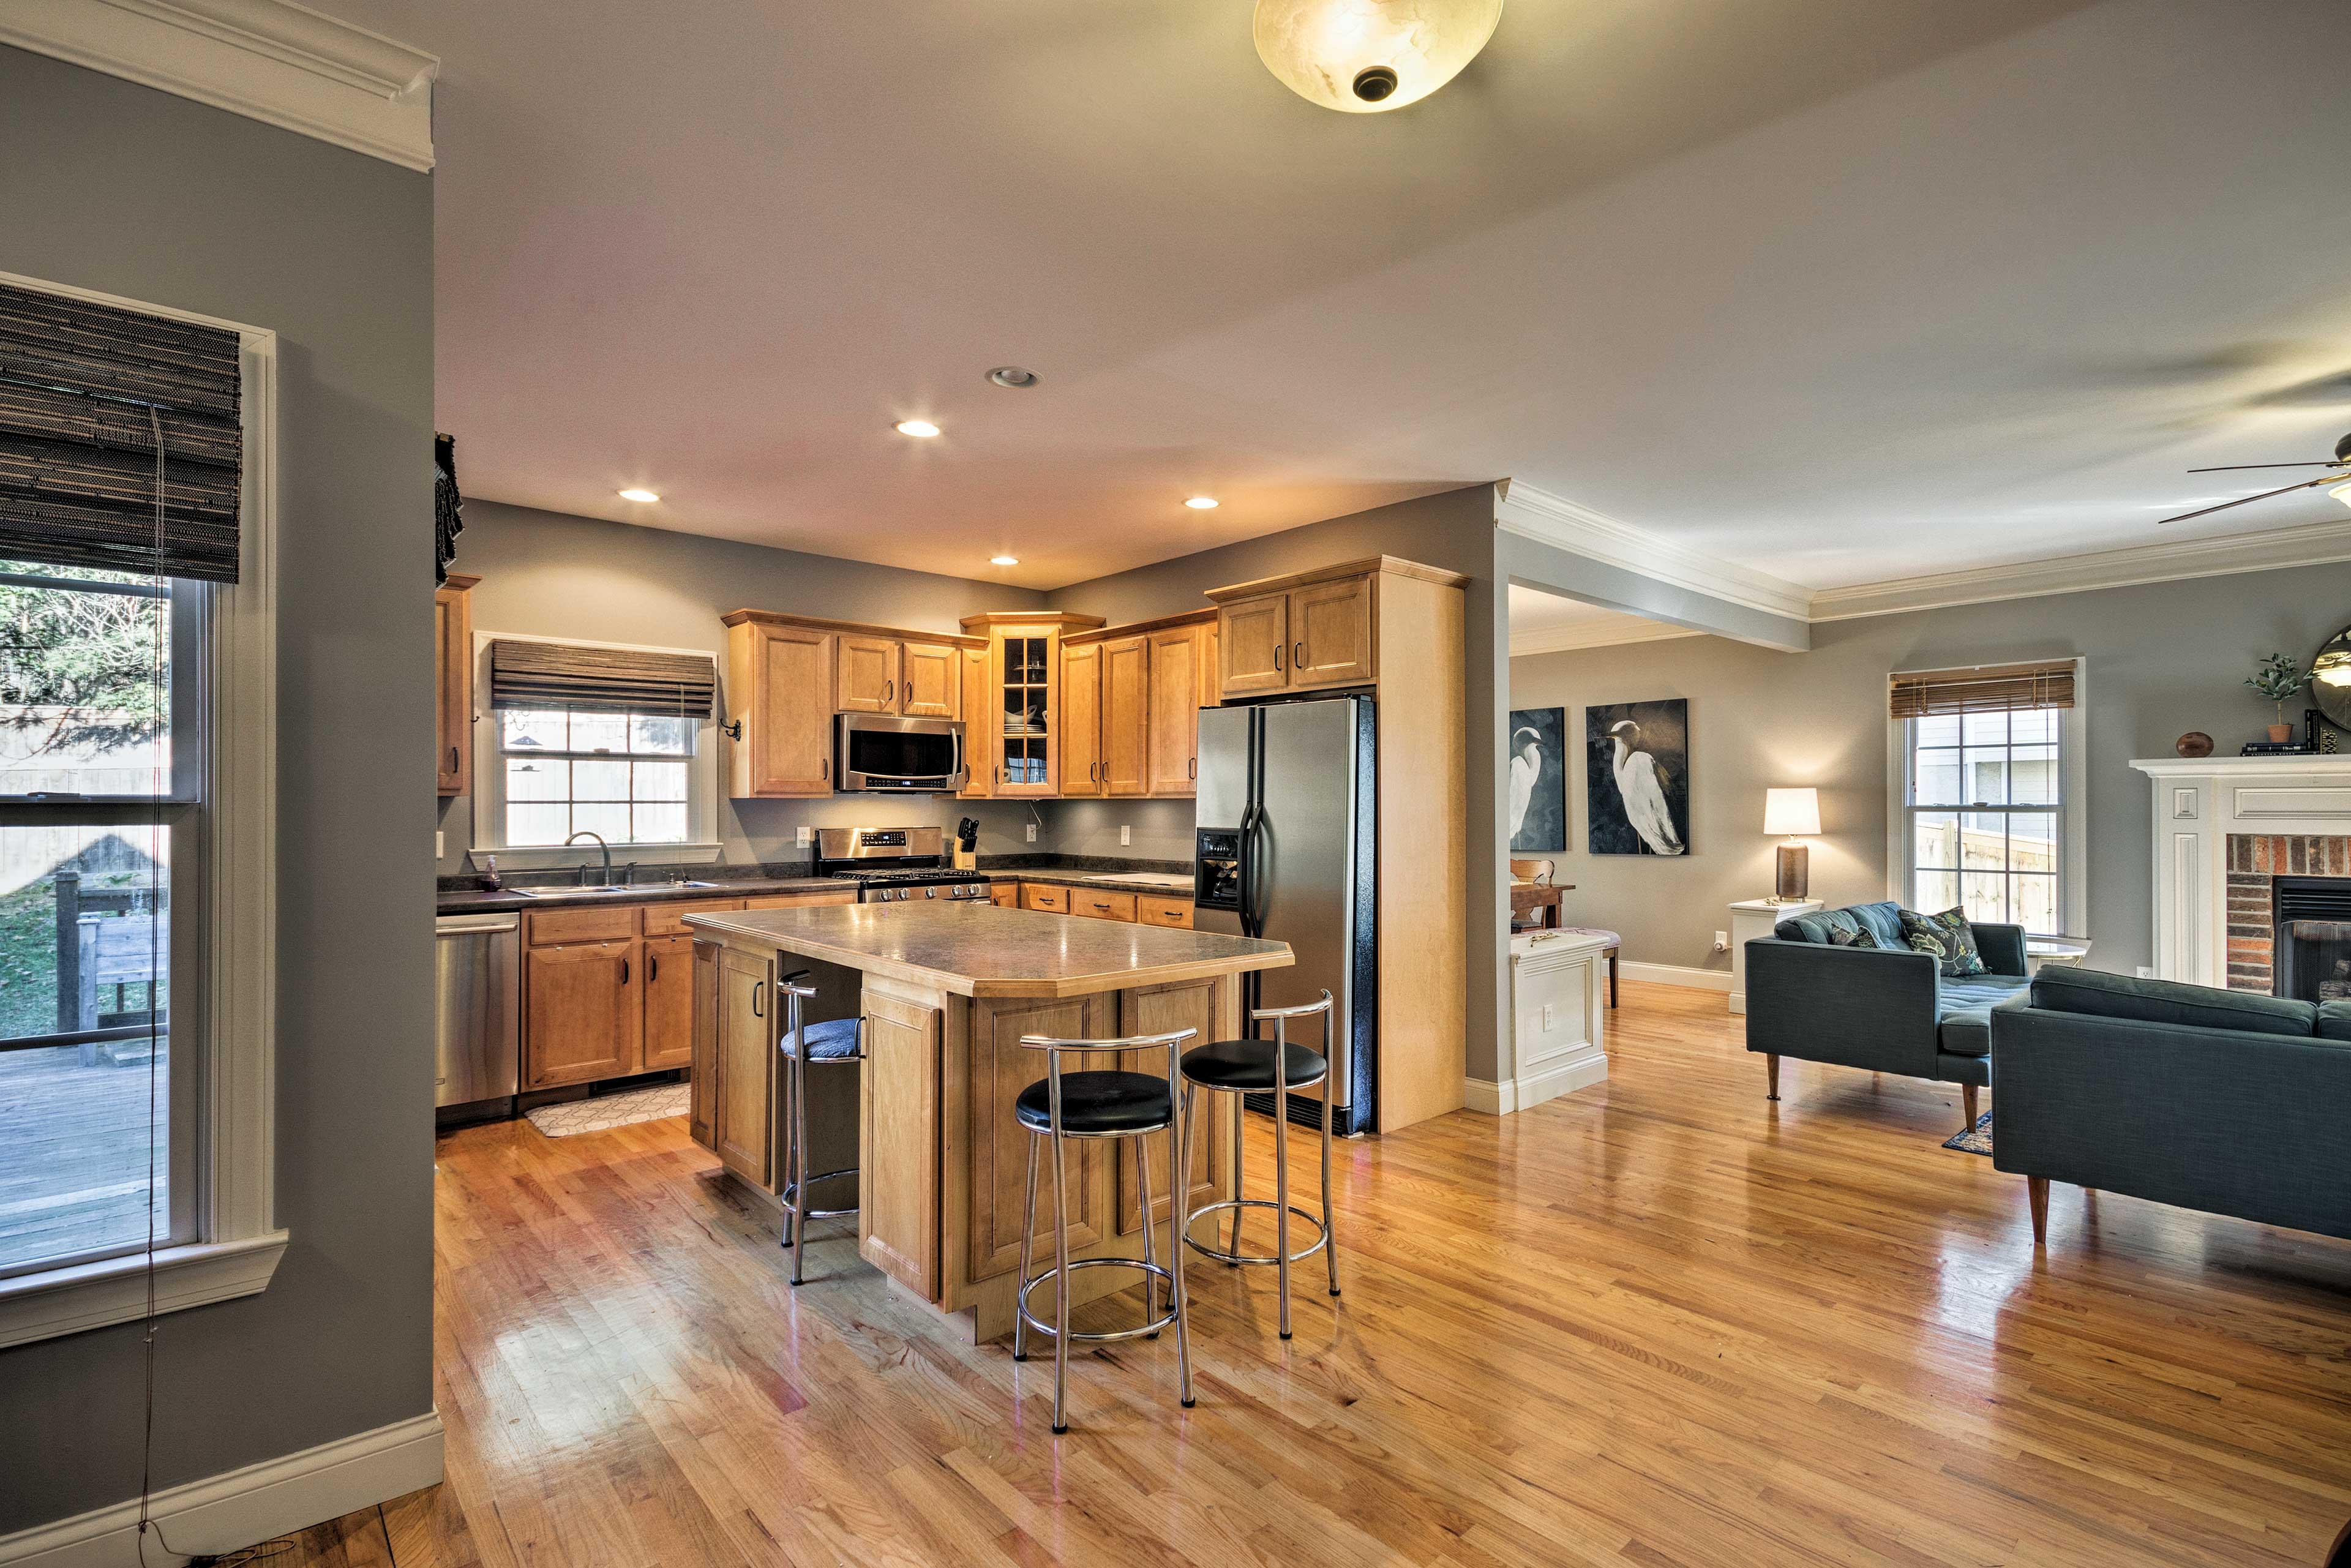 The open floor plan makes the home feel even more spacious.